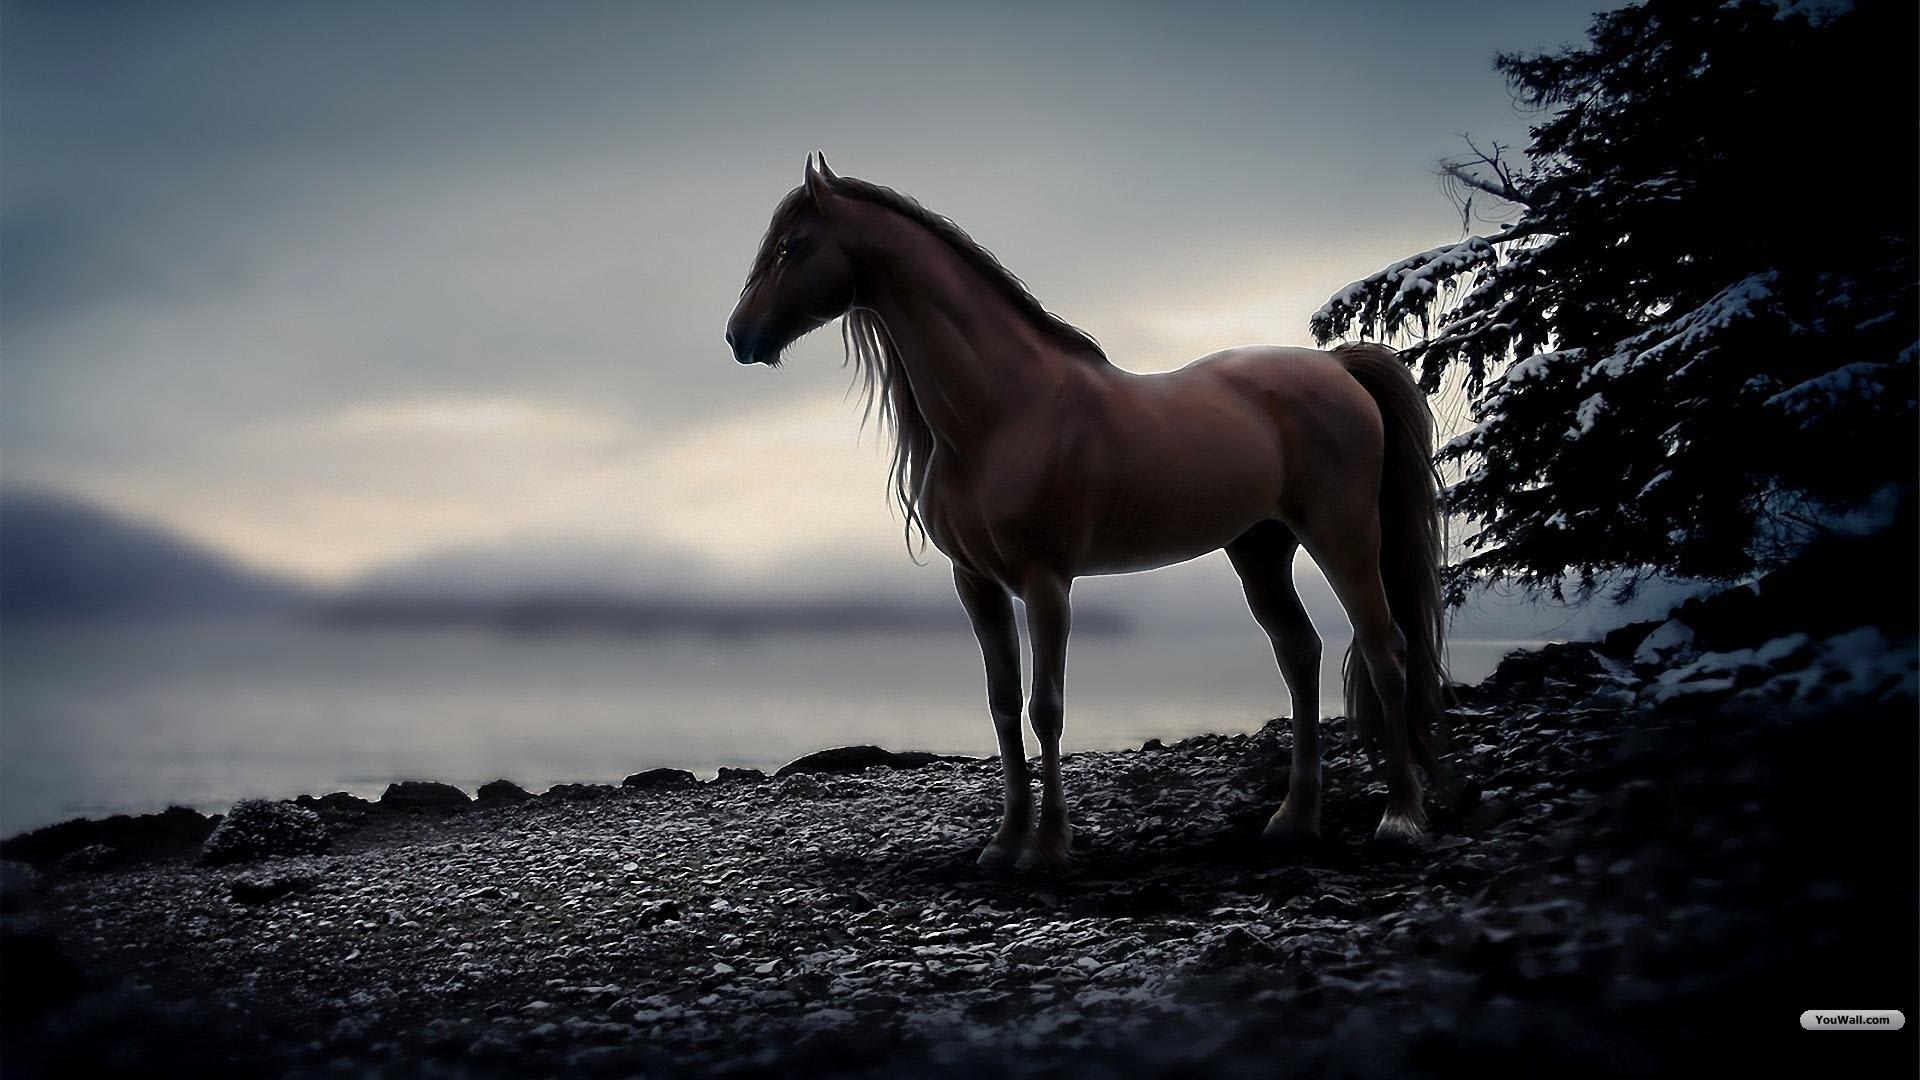 horse desktop wallpaper 1920x1080